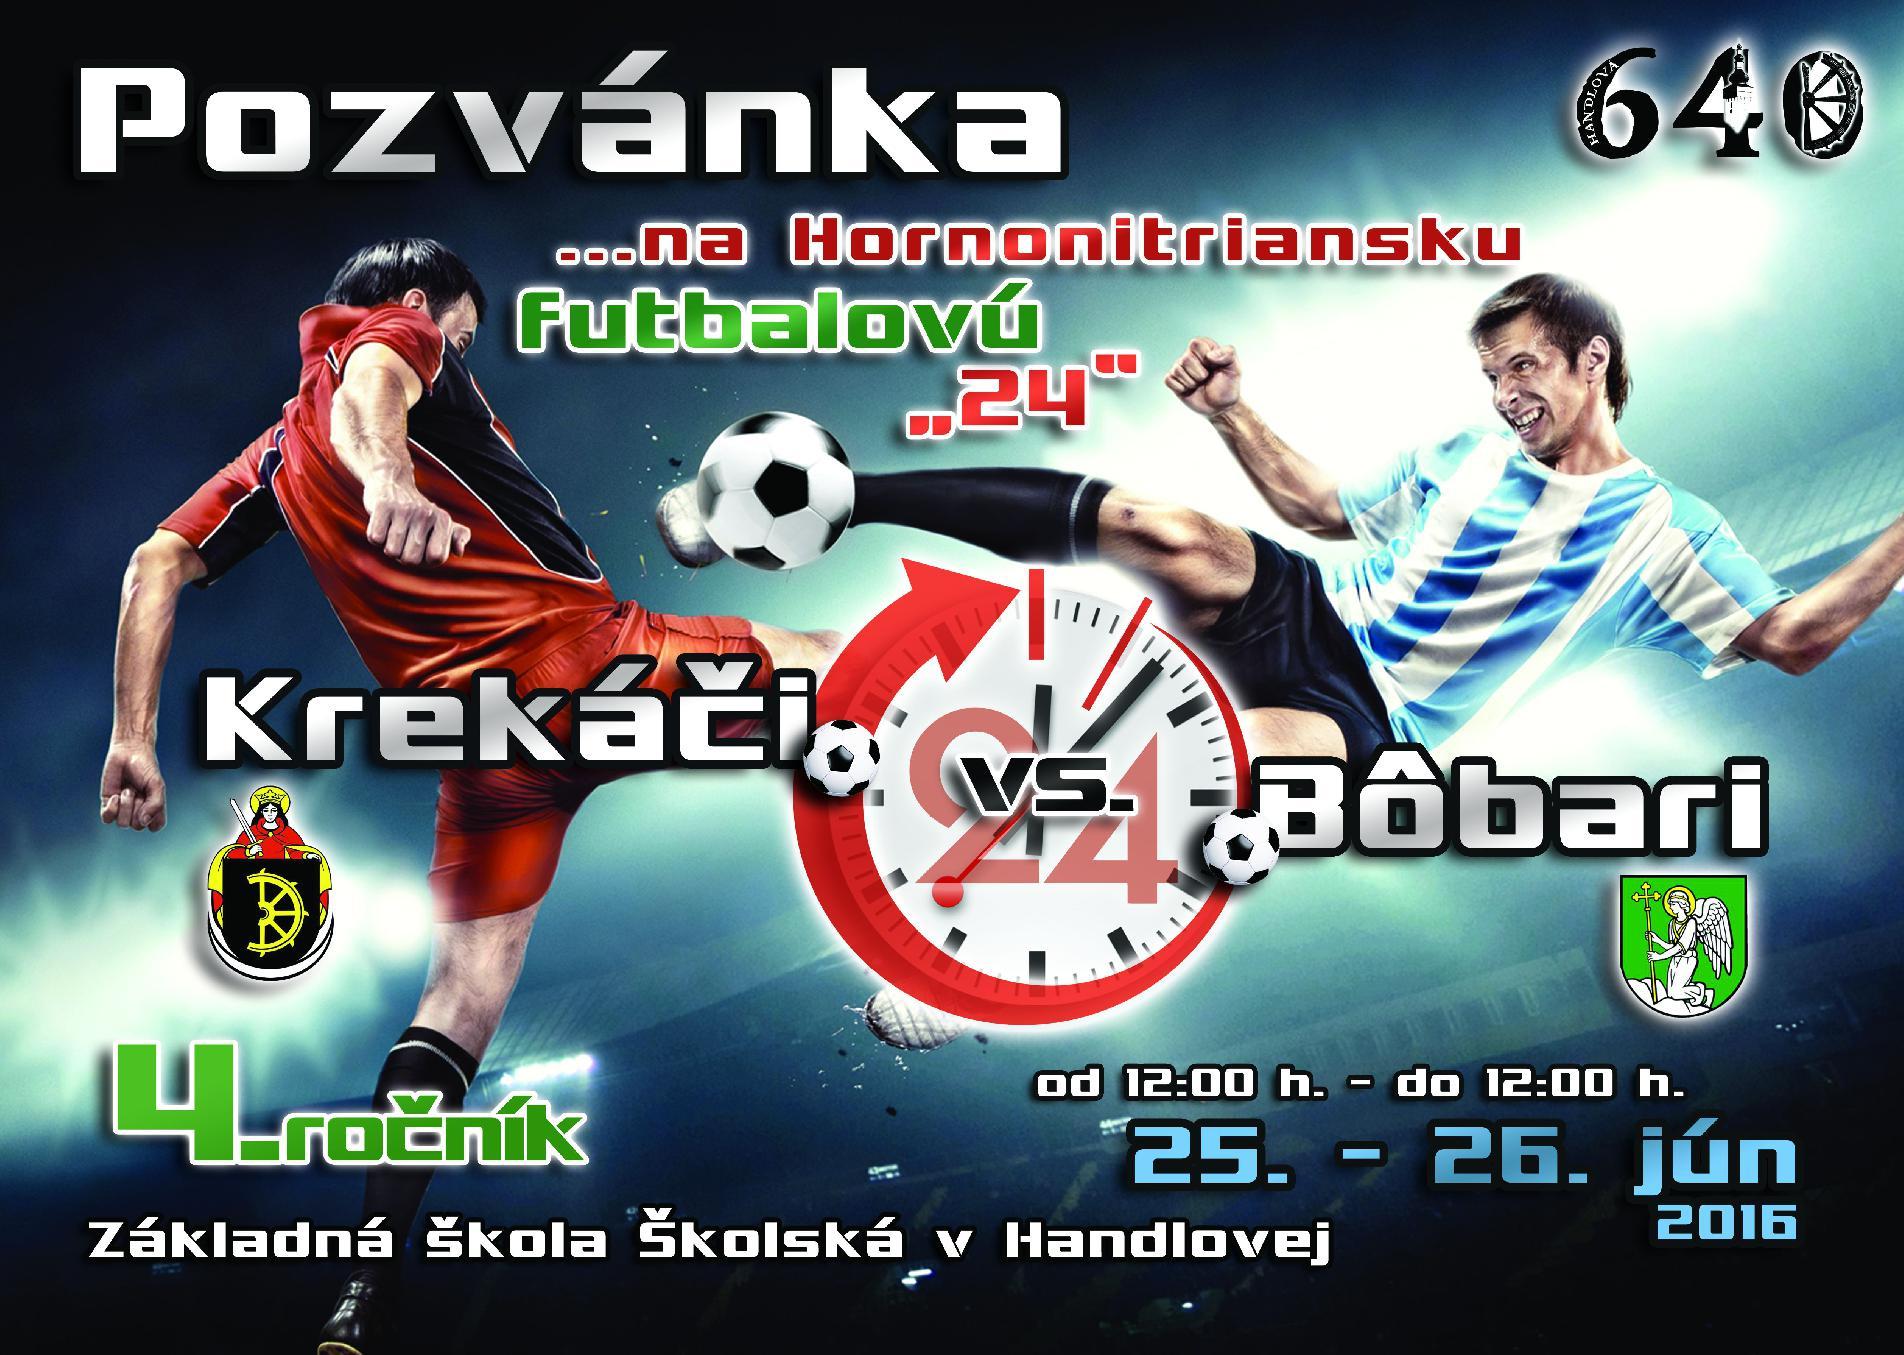 obr: Hornonitrianska futbalová 24-ka